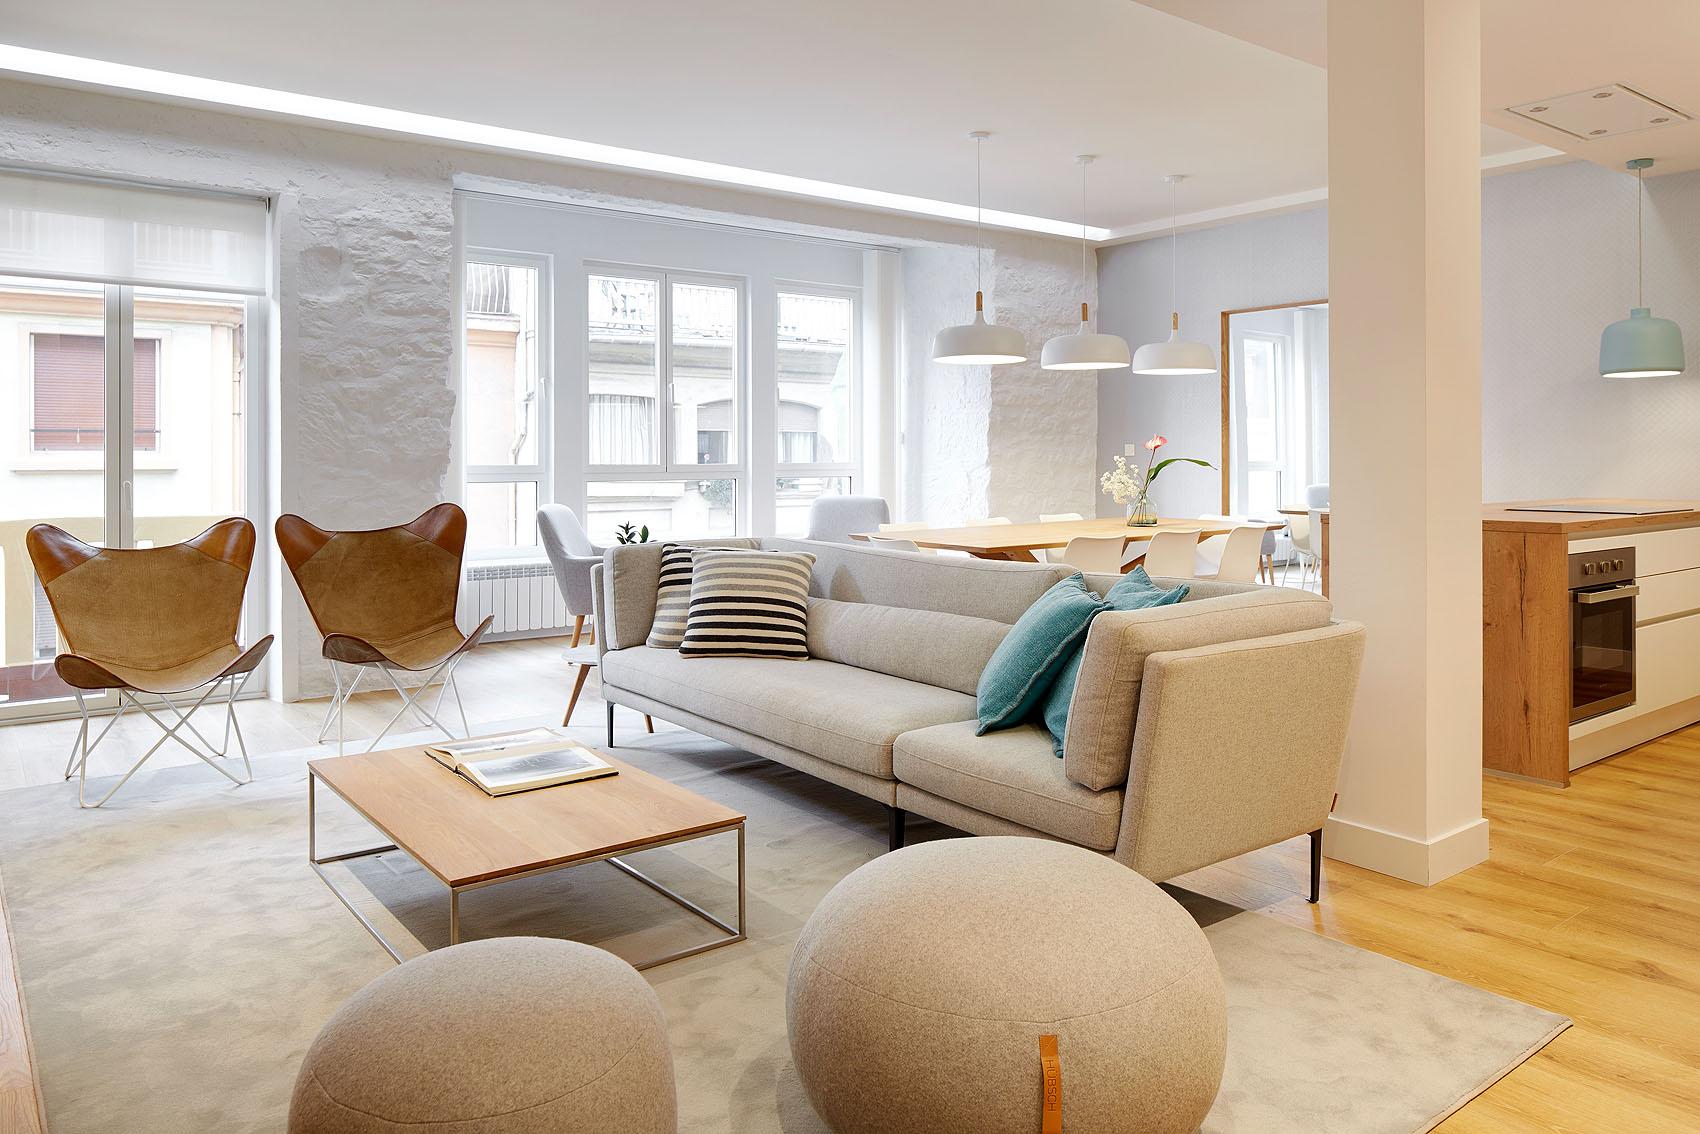 Apartamento Marugame - Iñaki Caperochipi - Fotografía